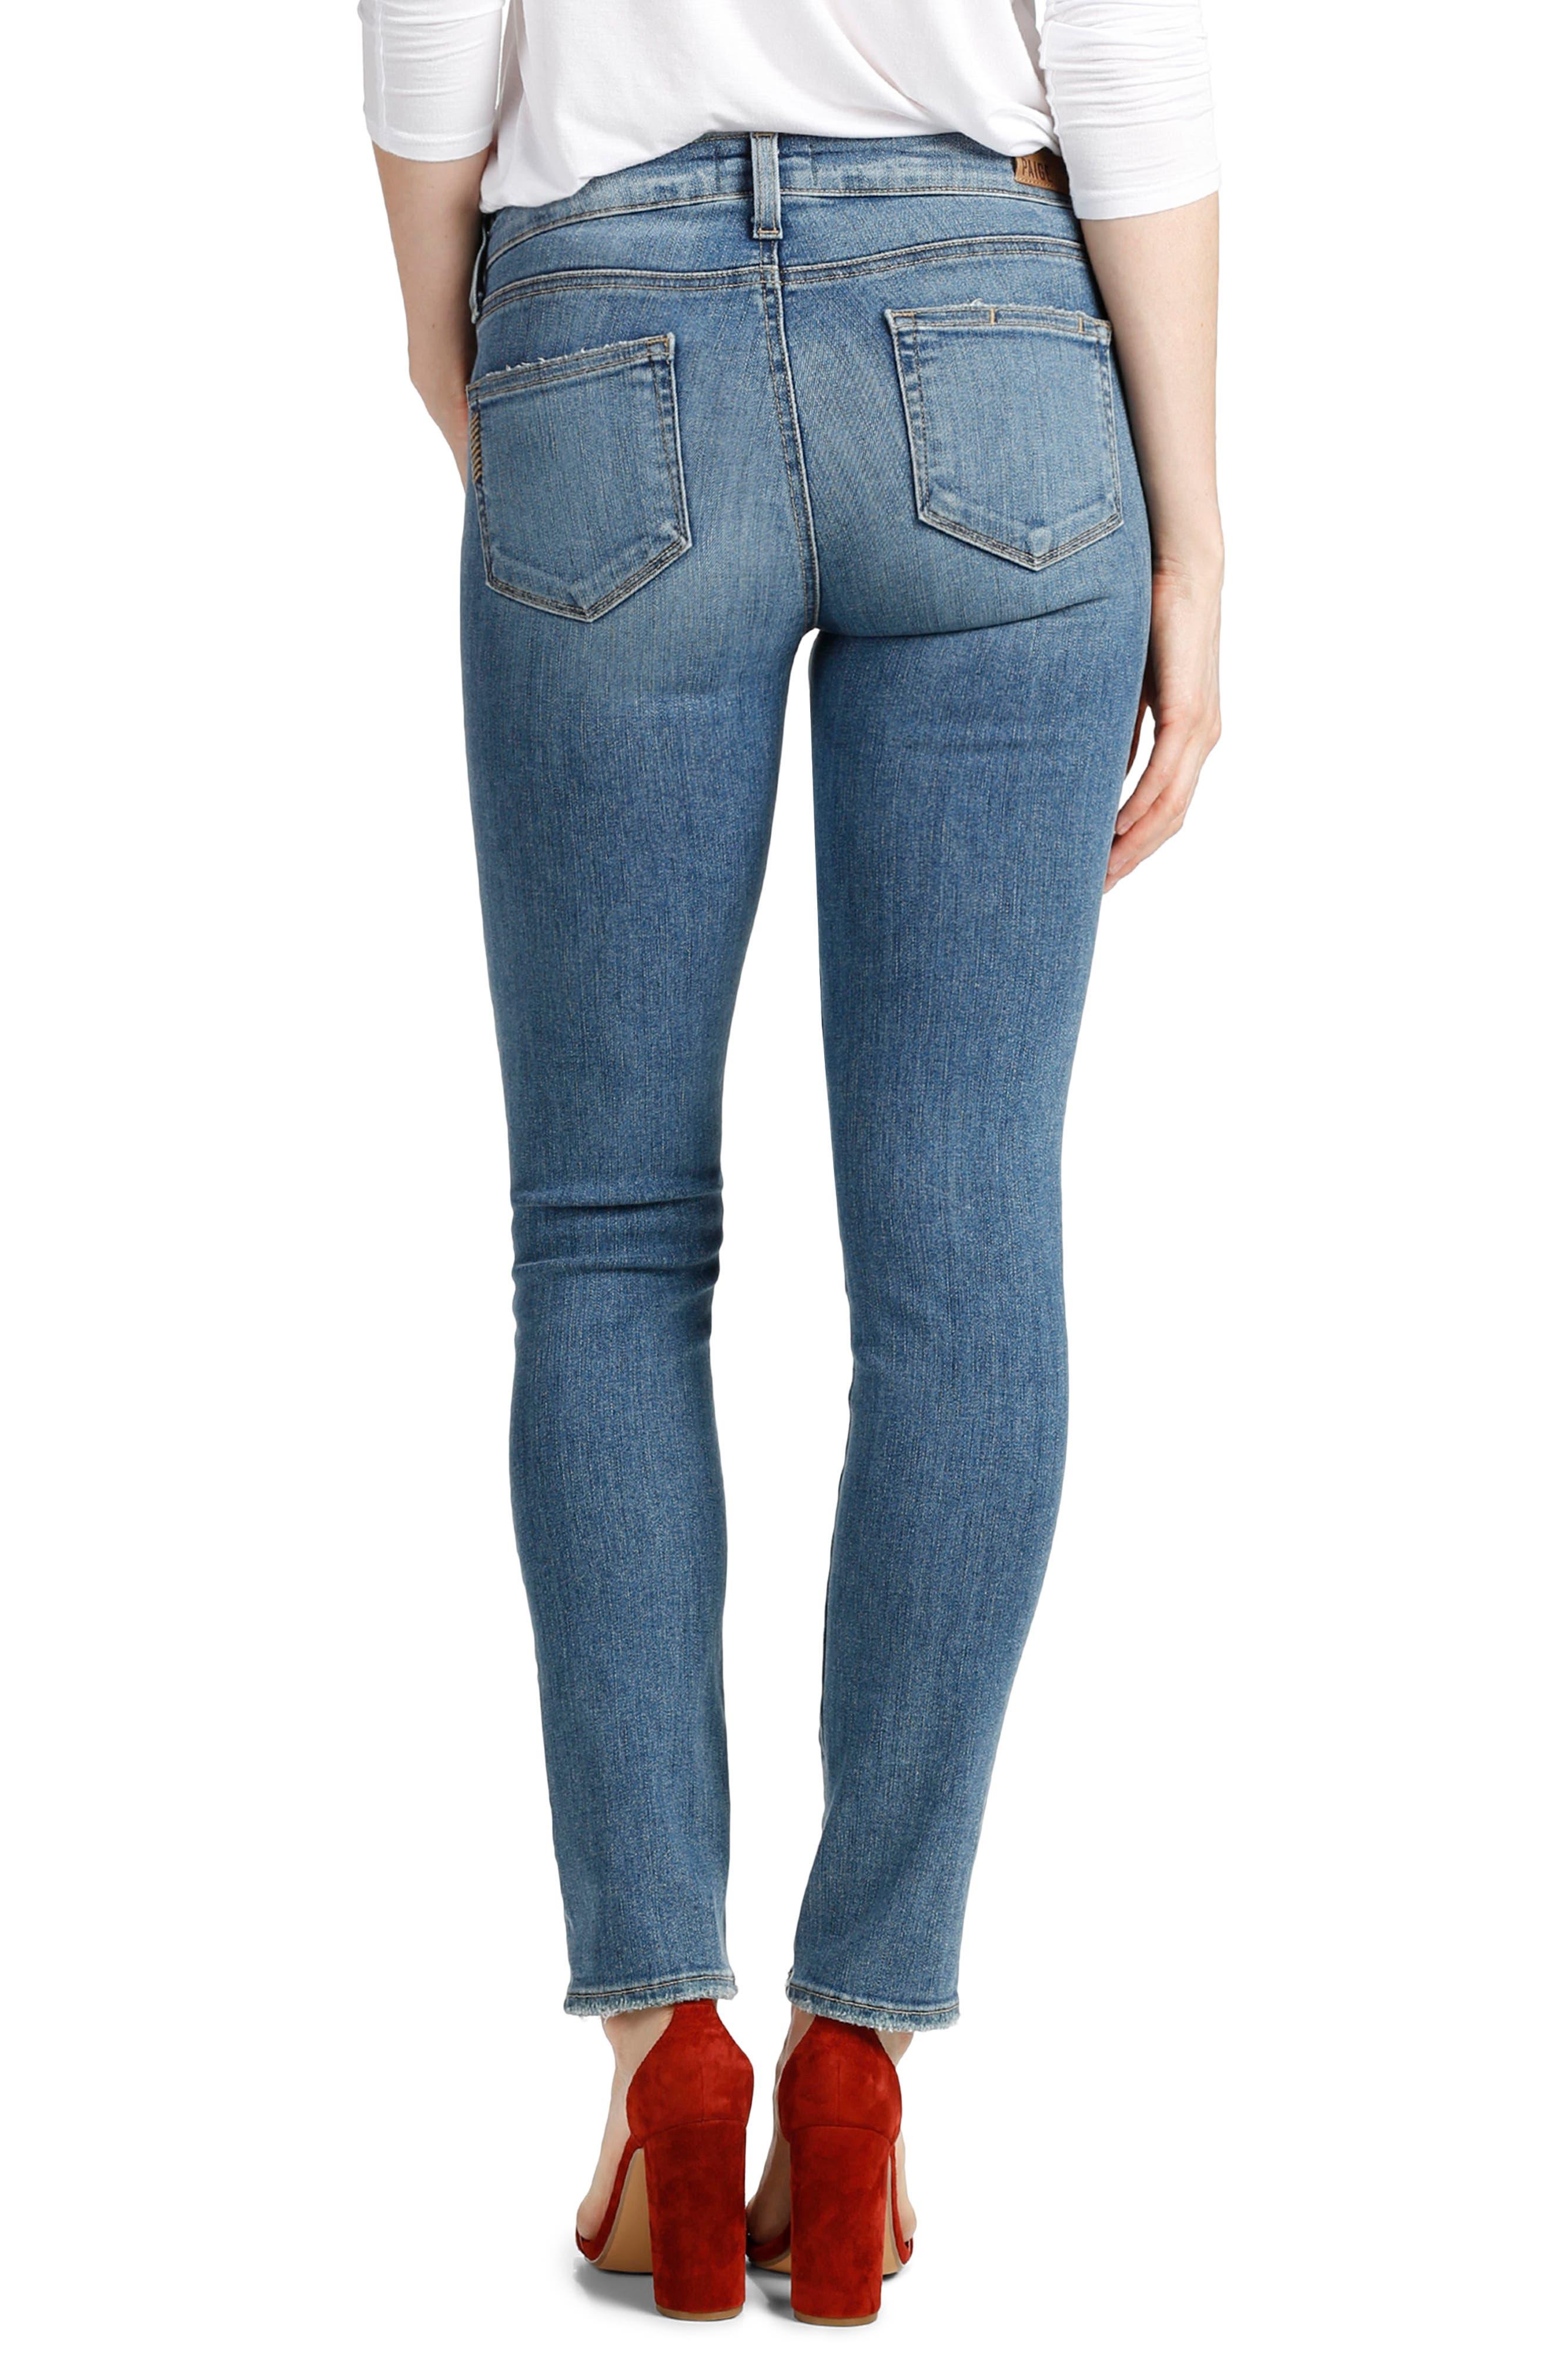 Transcend - Skyline Ankle Peg Skinny Jeans,                             Alternate thumbnail 3, color,                             Sienna